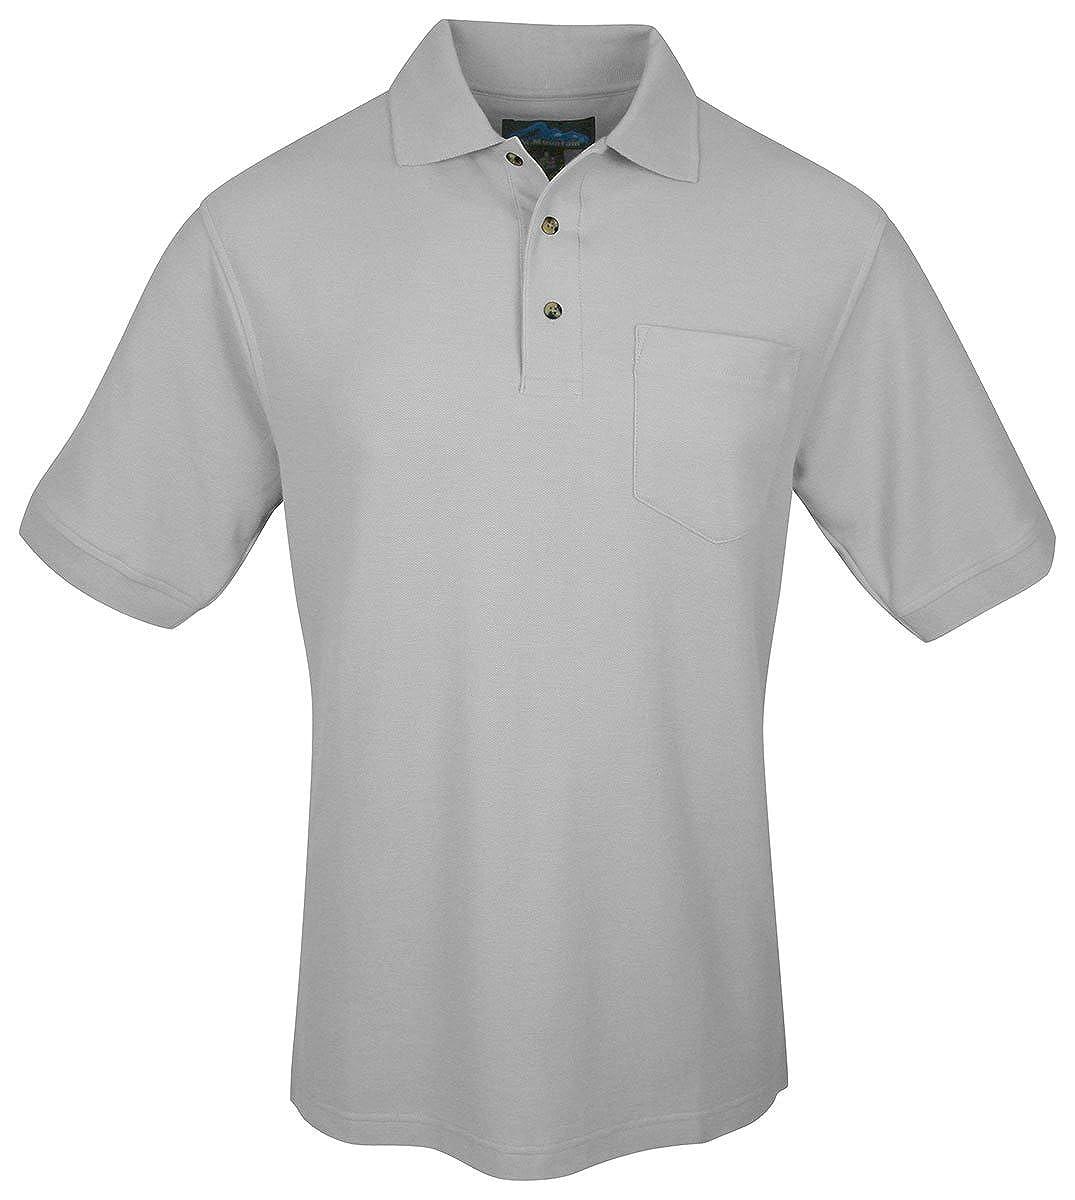 Tri-Mountain 8.2 oz 100/% Cotton 169 Signature Ltd.